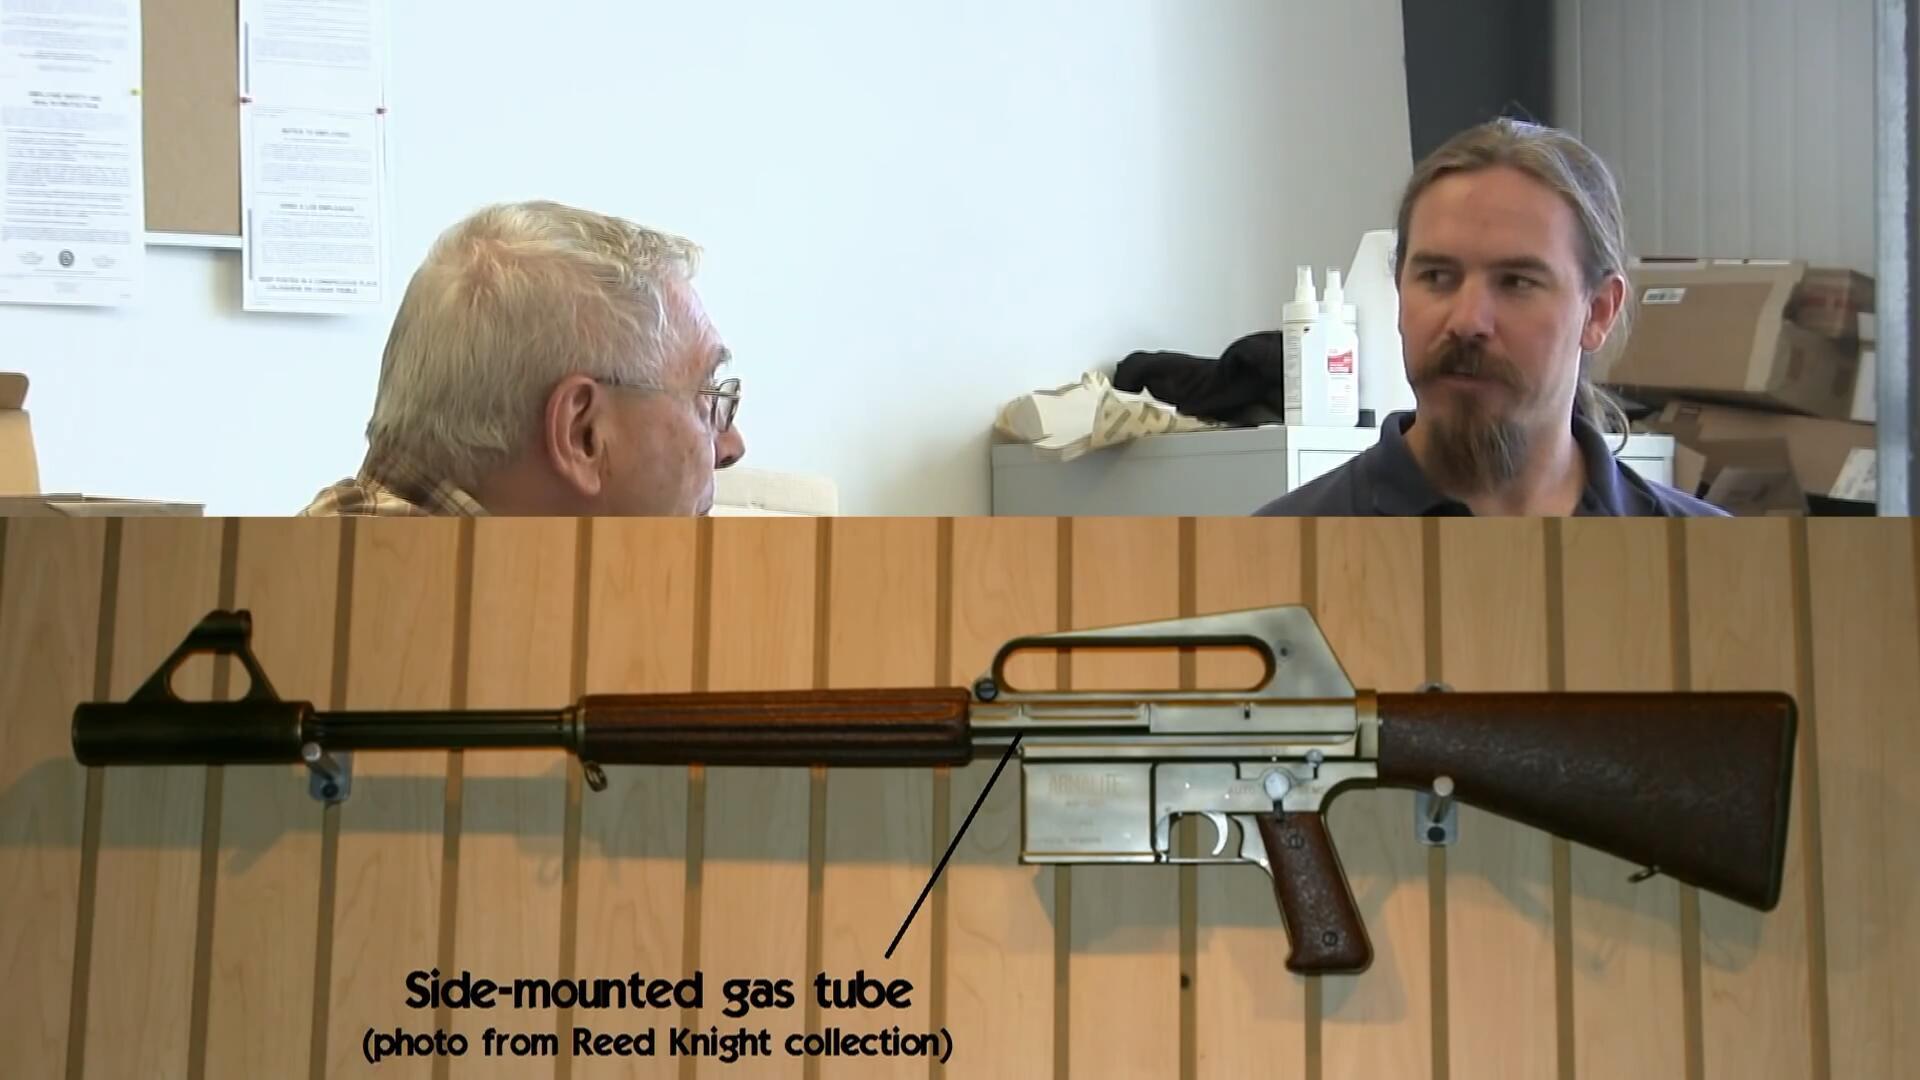 【InRangeTV/双语】采访AR-15设计师詹姆斯·苏利文/恒定后座AR靶场试射